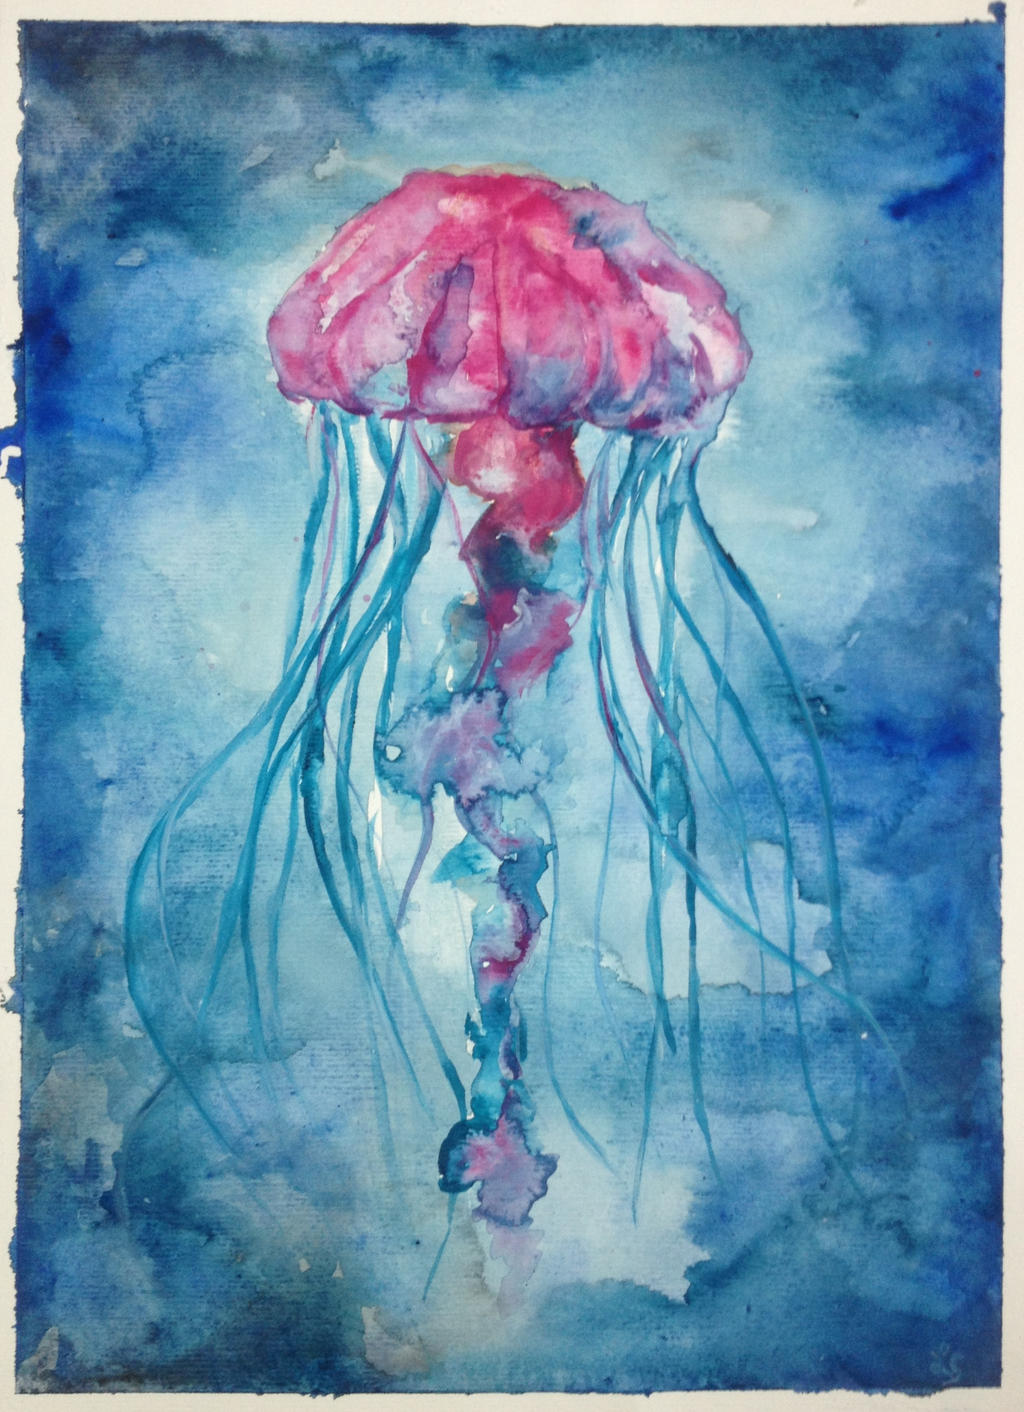 Jellyfish V by lenischoen